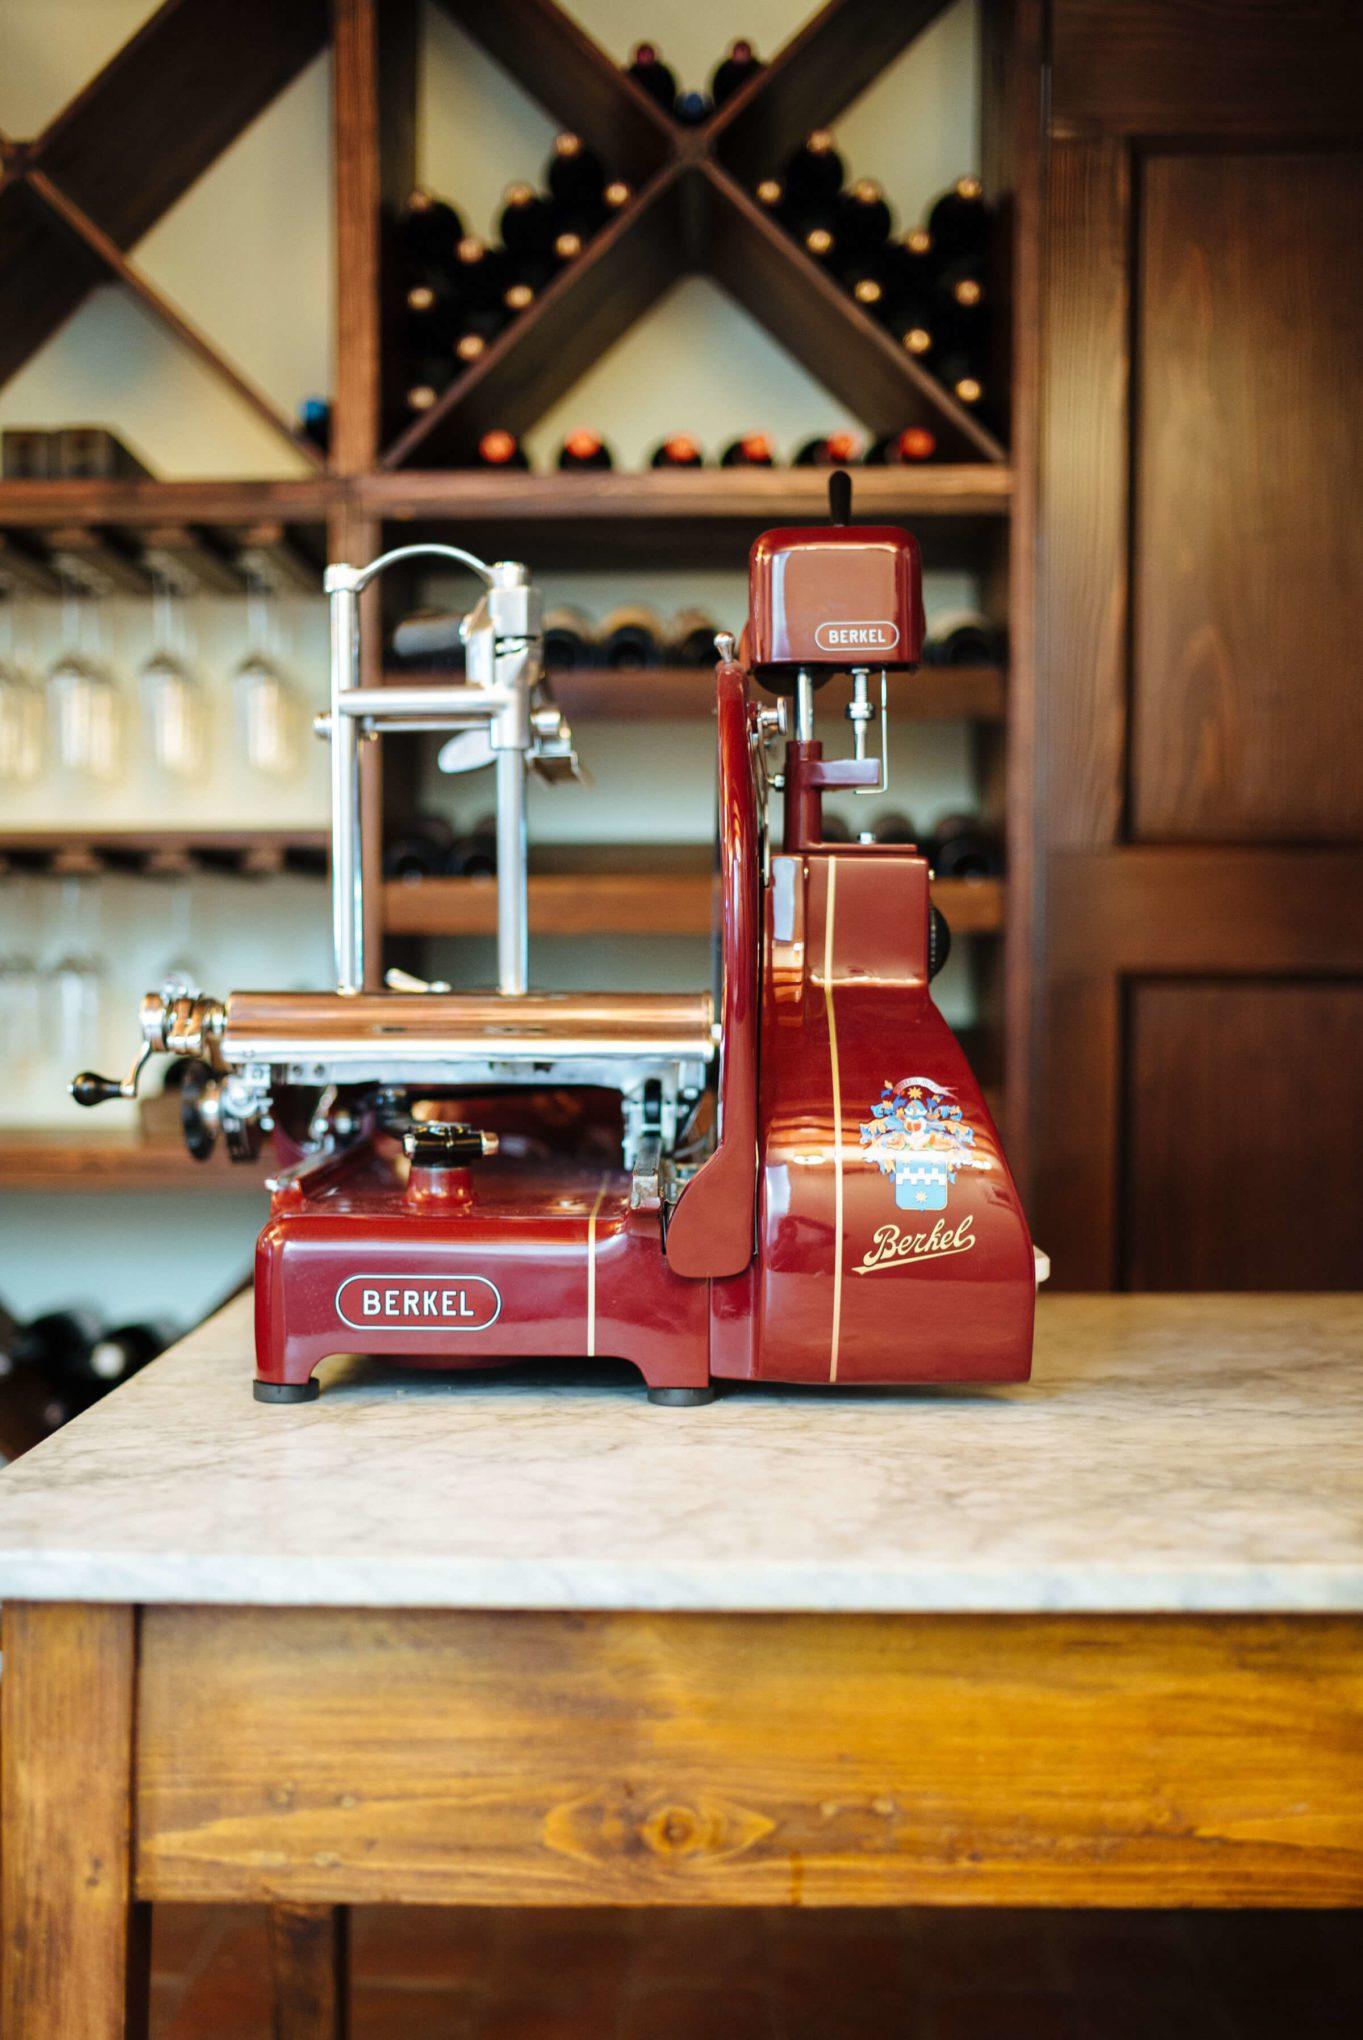 Berkel Slicer Espresso maker La Marzocco Factory Tour in Florence, The Taste Edit